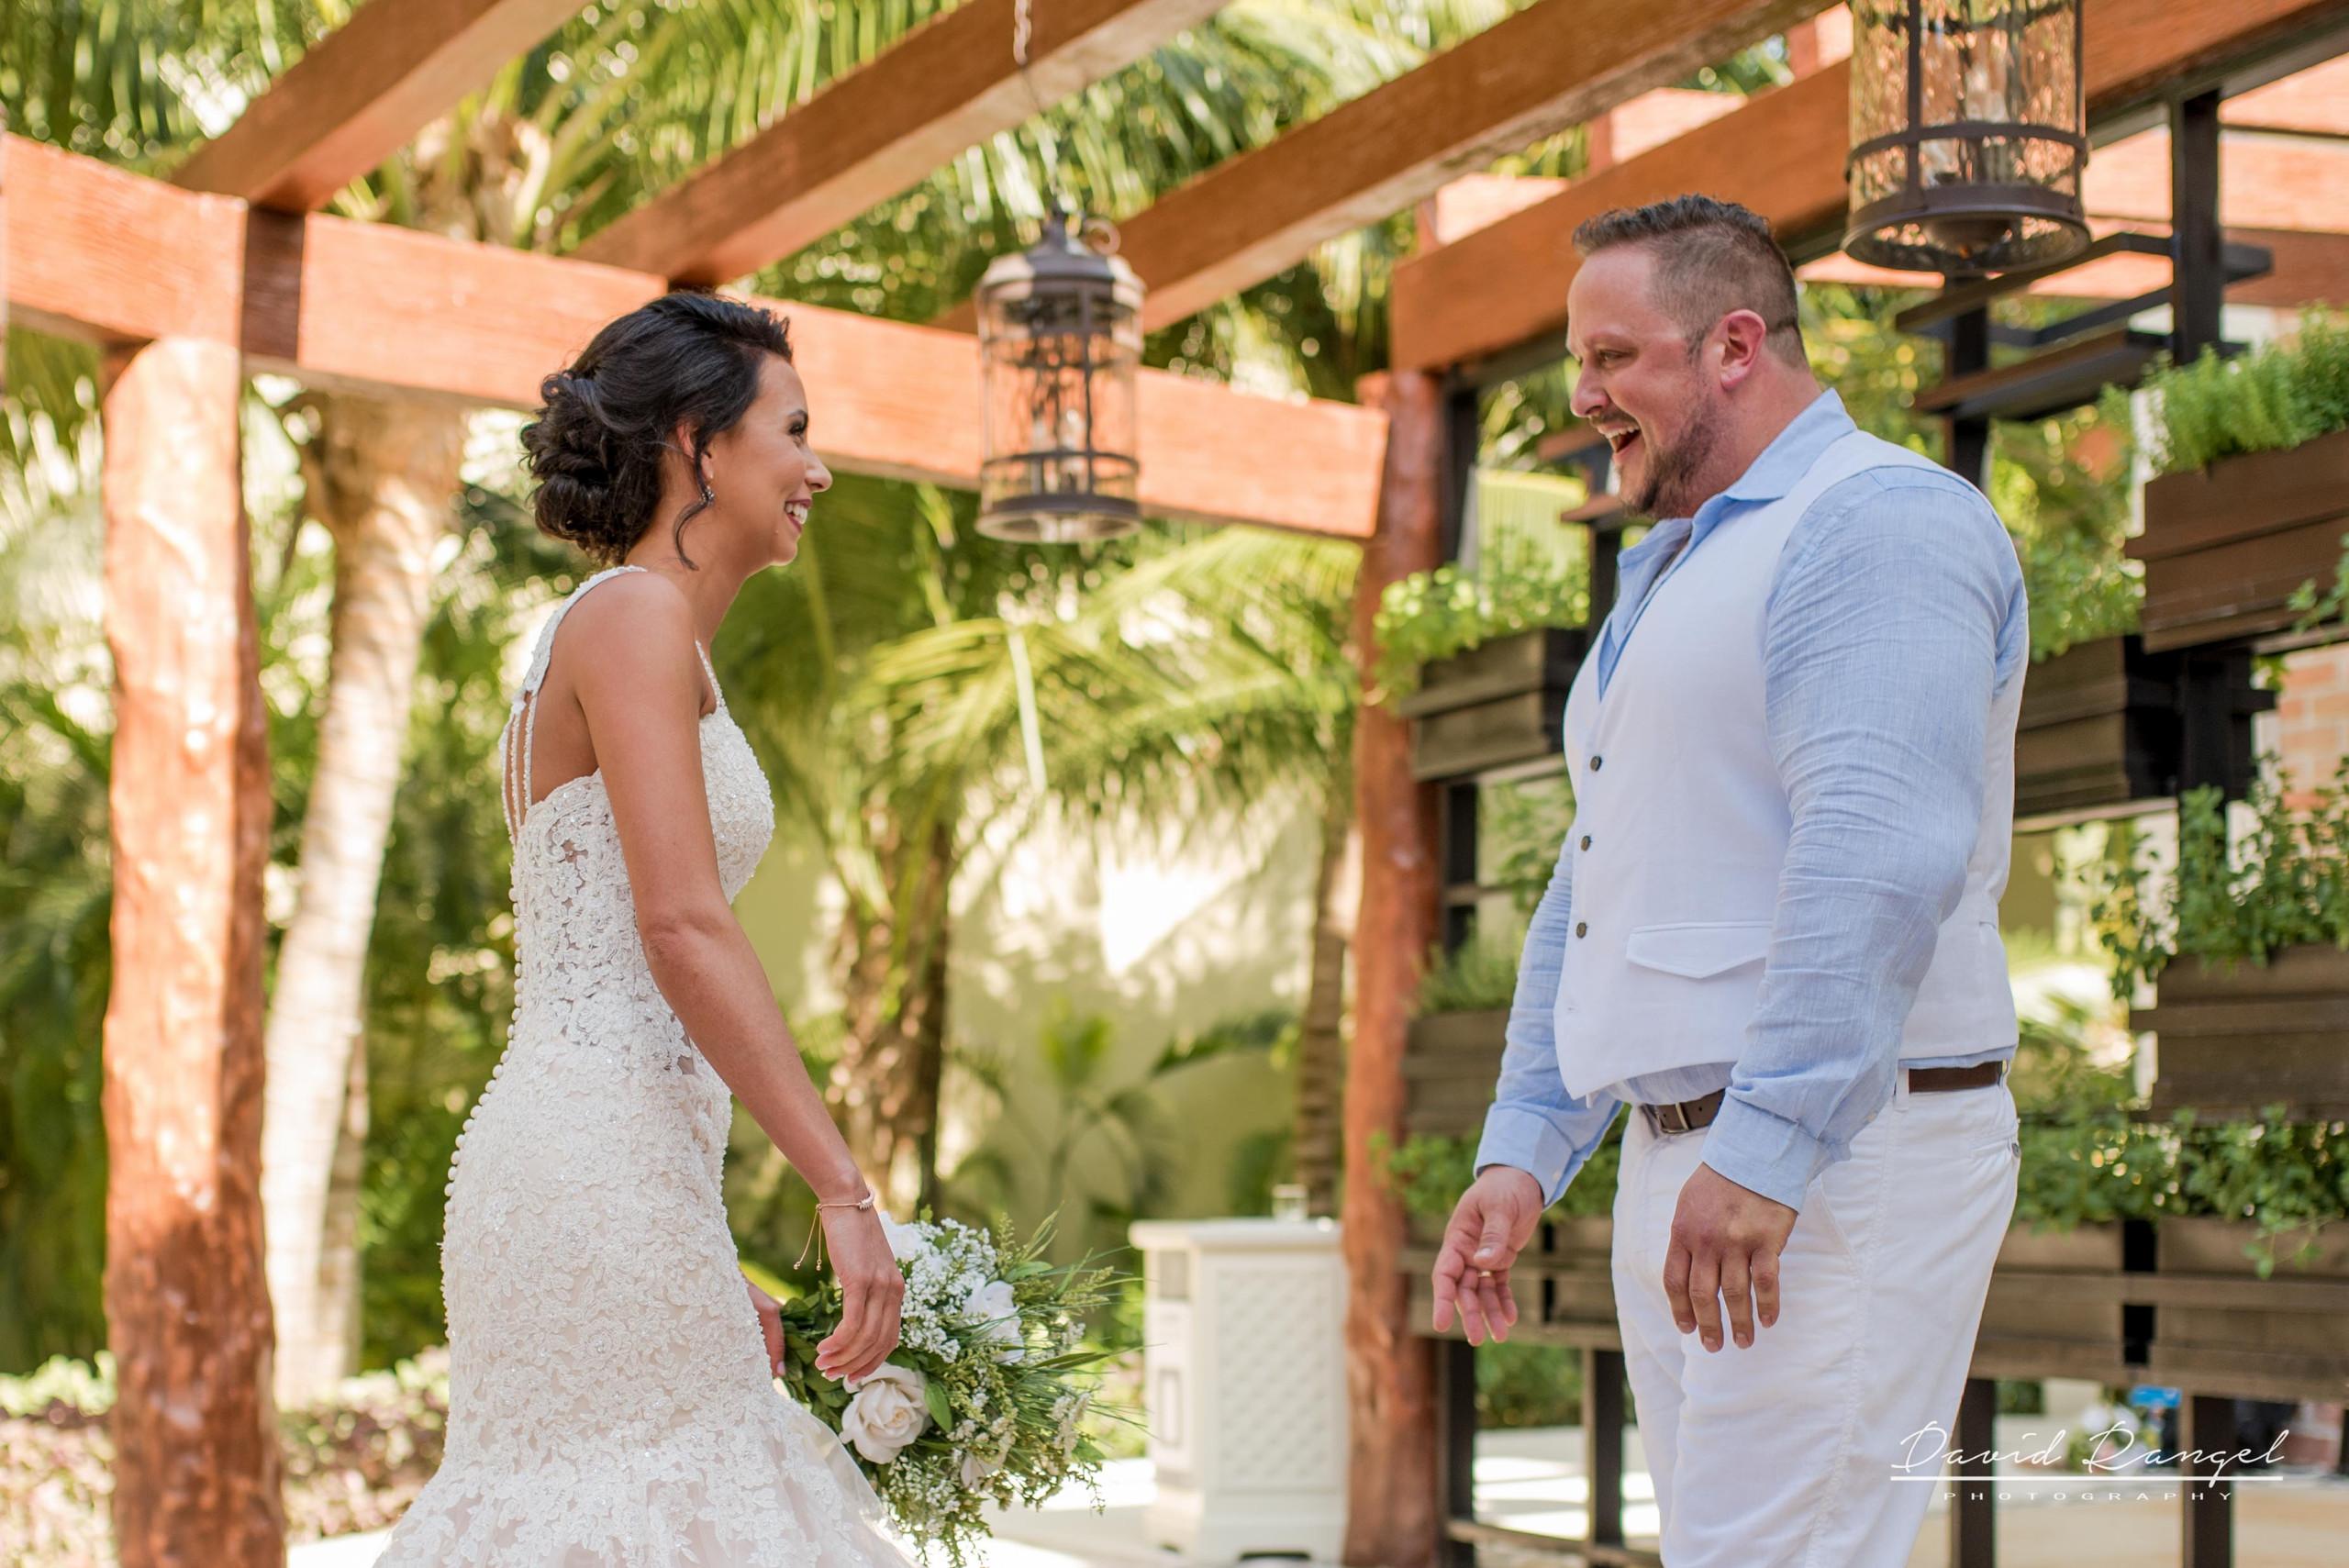 firstlook+bride+groom+to+be+couple